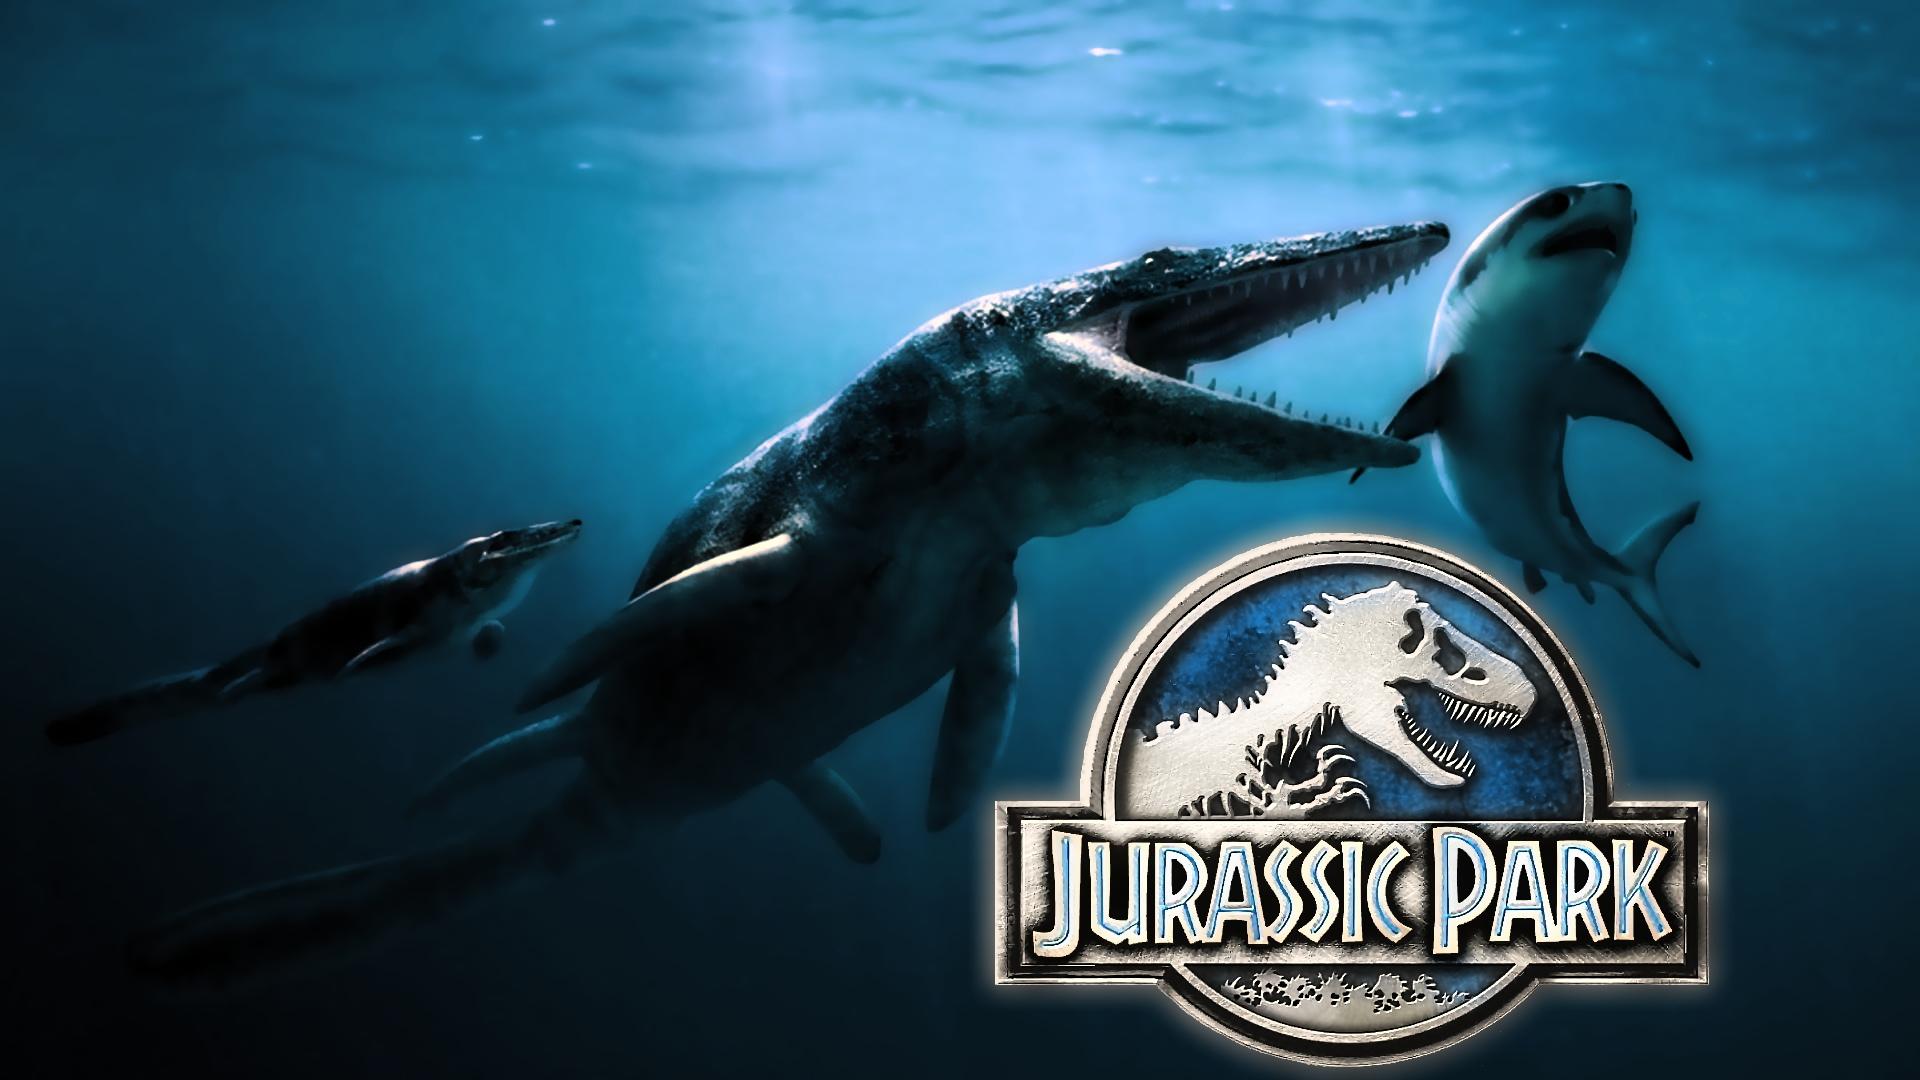 Jurassic_Park_2015_Monstres_Marins.jpg